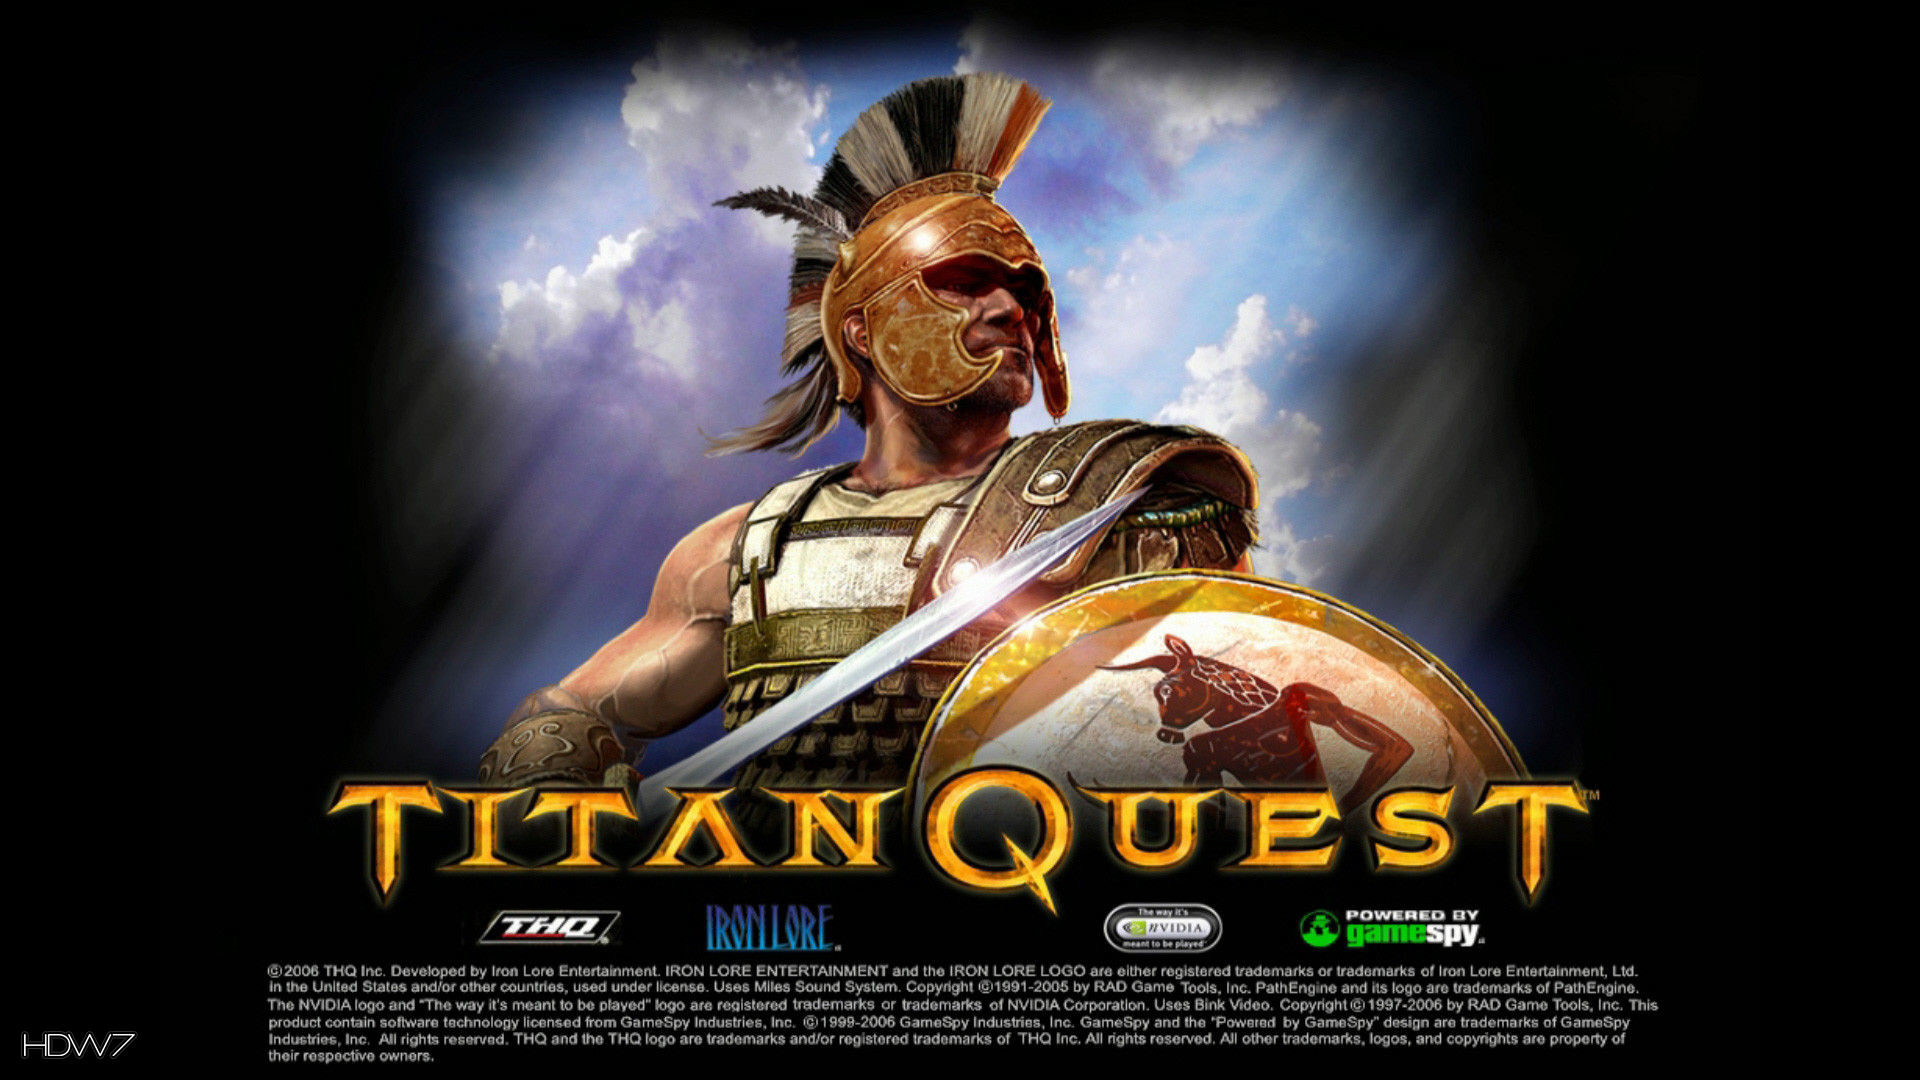 titan quest game hack and slash